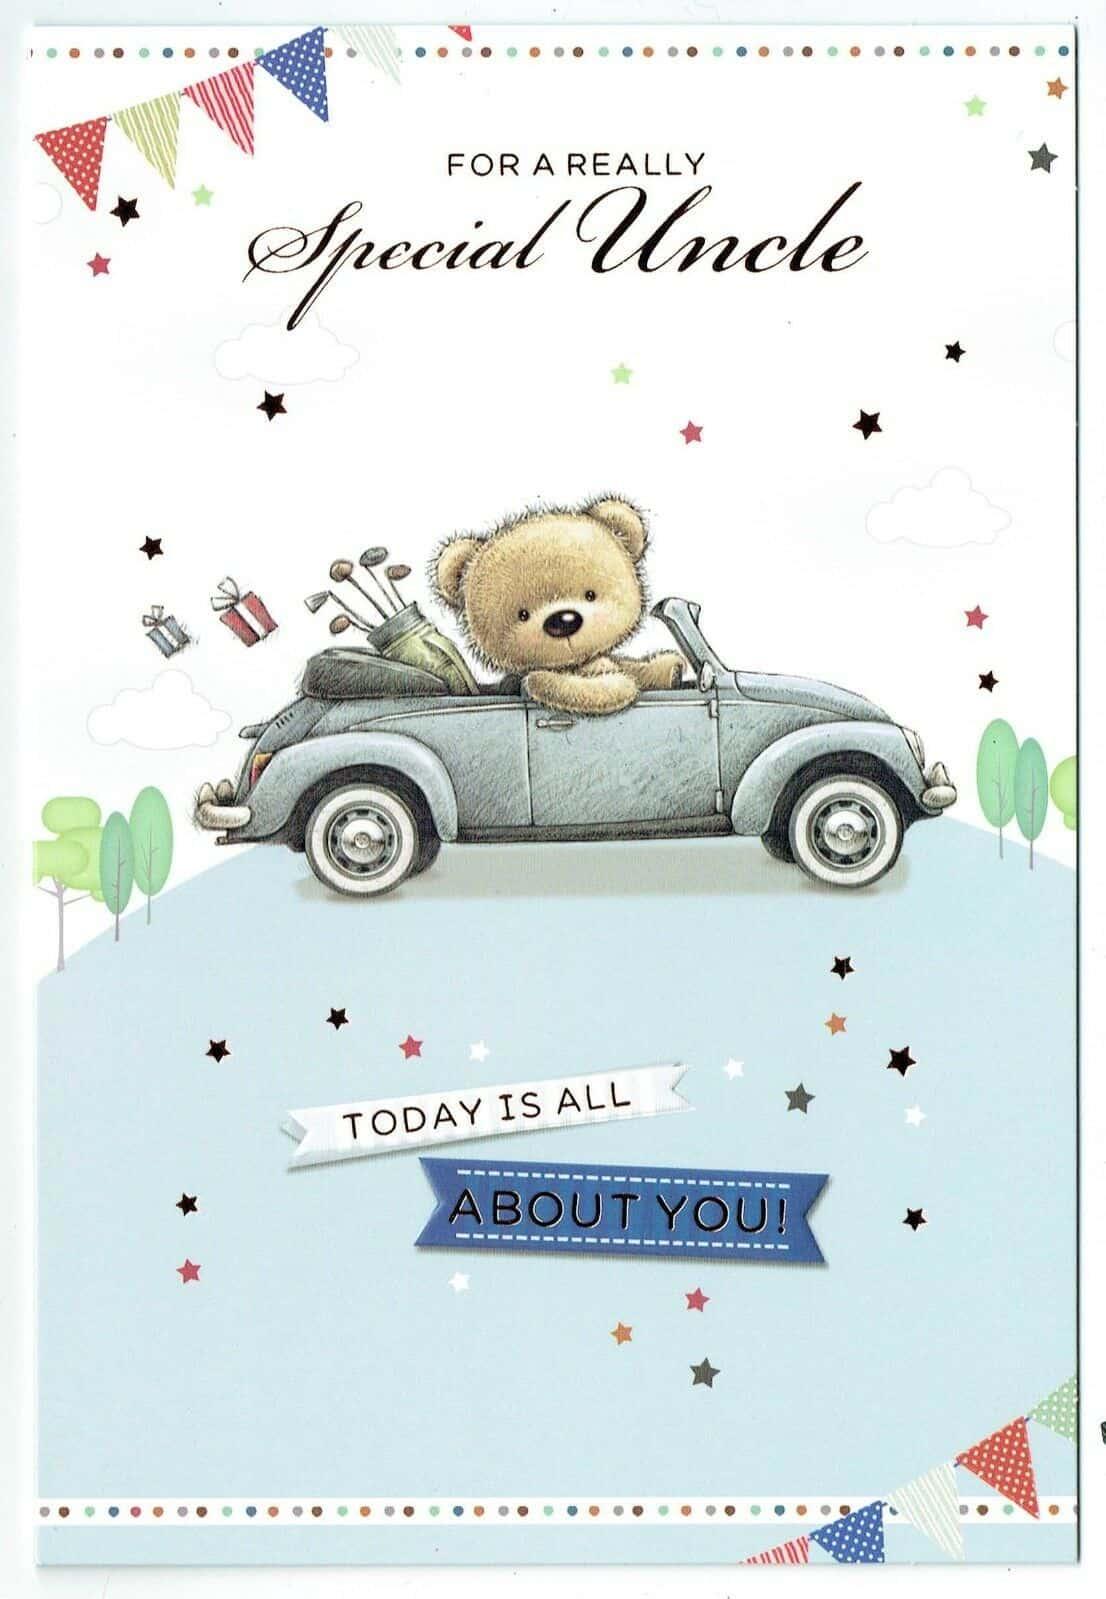 Uncle Birthday Card With Teddy Bear Design 283083279006